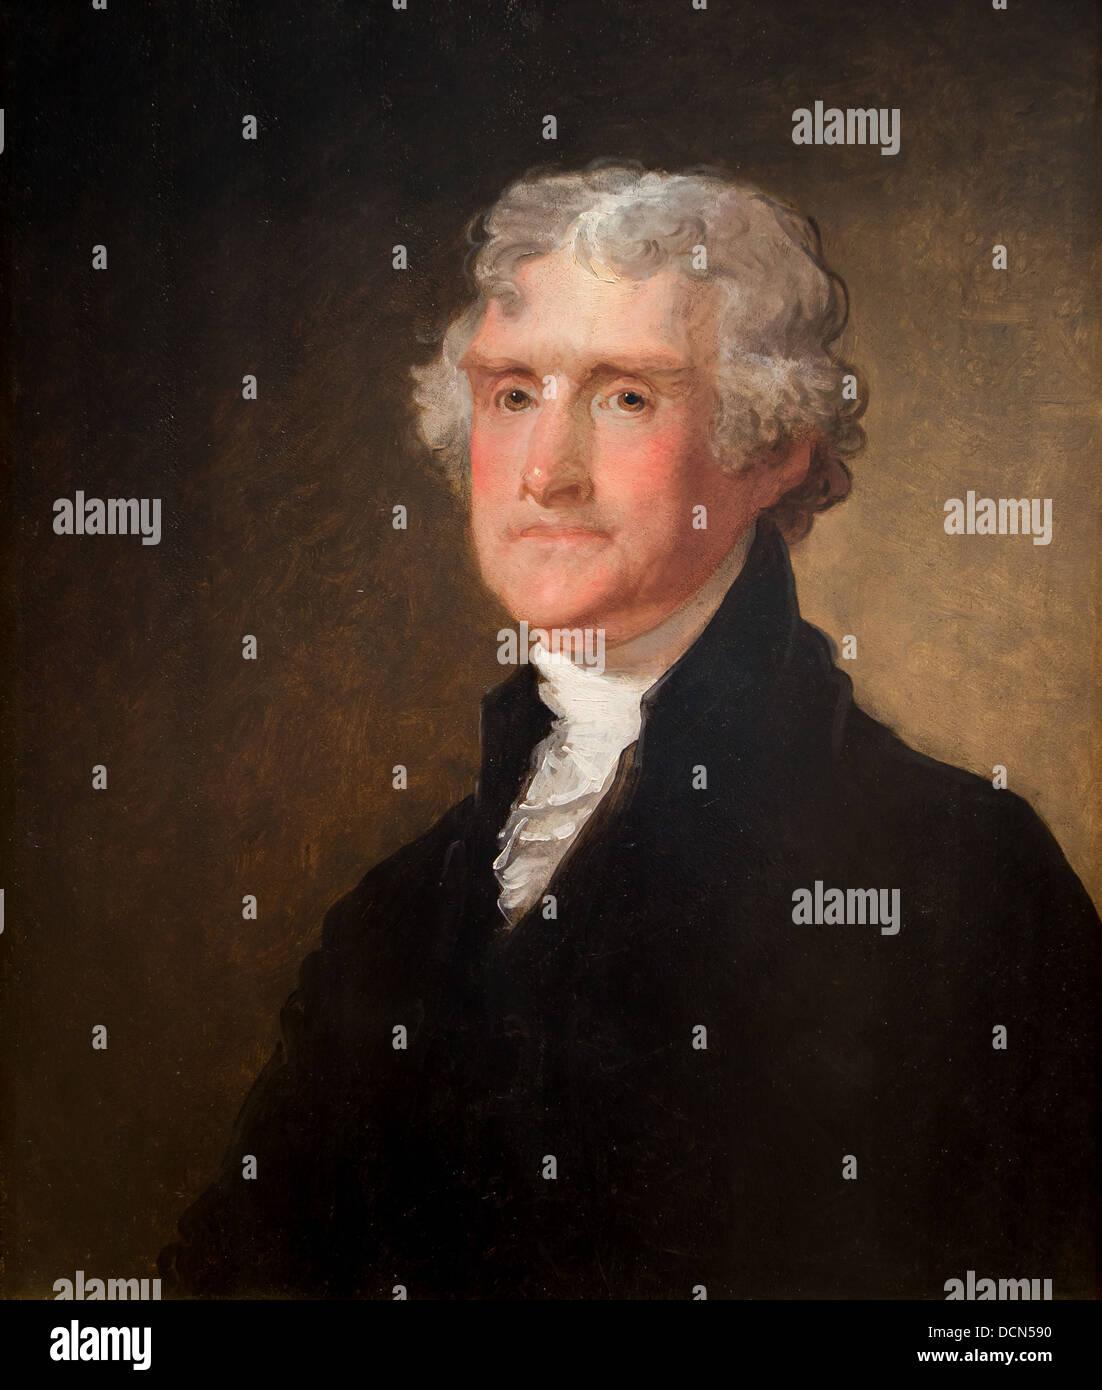 19th century  -  Thomas Jefferson - Gilbert Stuart (1821) Philippe Sauvan-Magnet / Active Museum - Stock Image